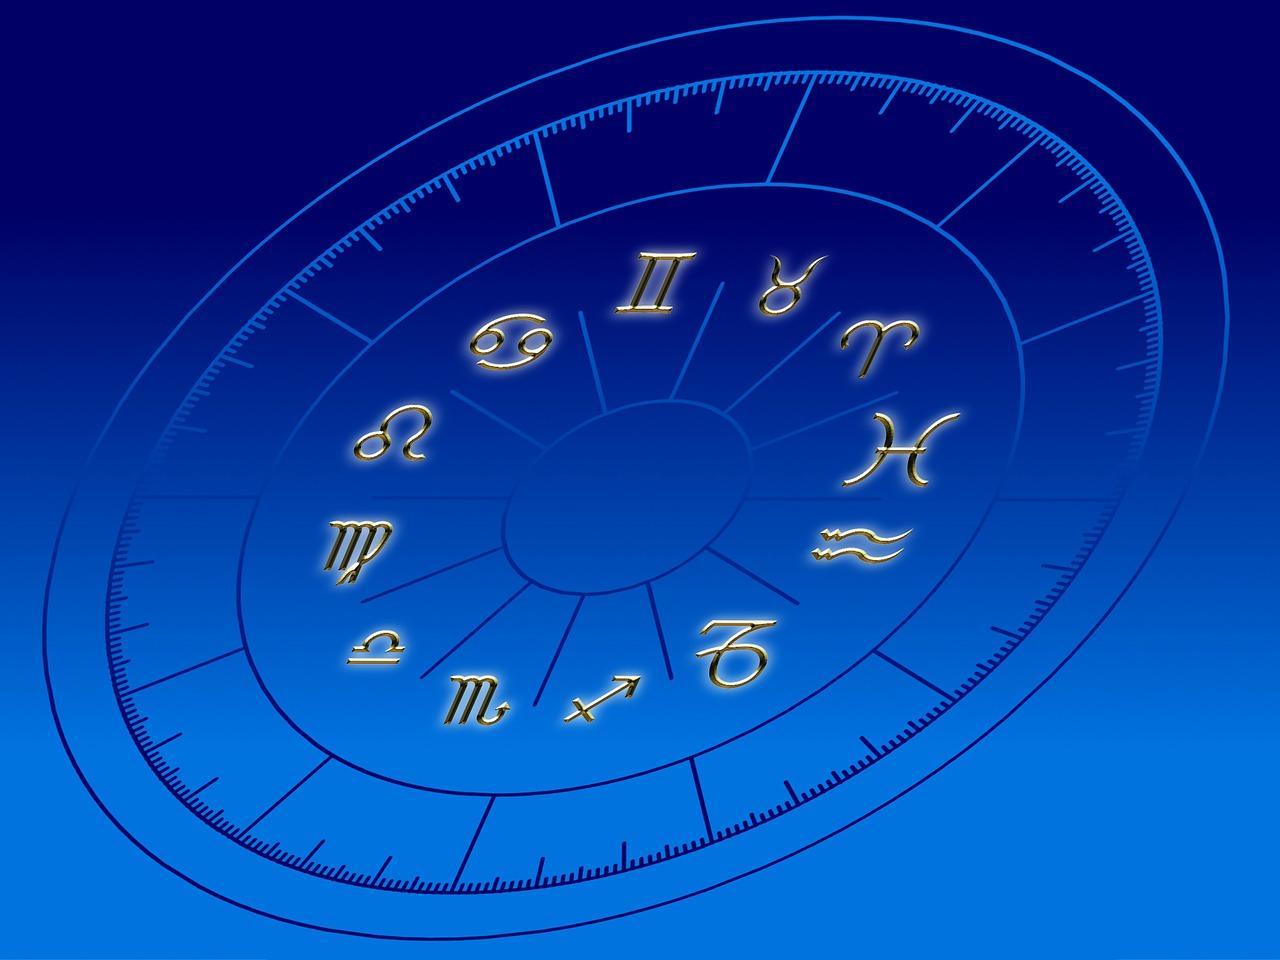 Horoscop 21 ianuarie 2020 - Vesti mari, vin ceasuri bune ...  |Horoscop 21 Septembrie 2020